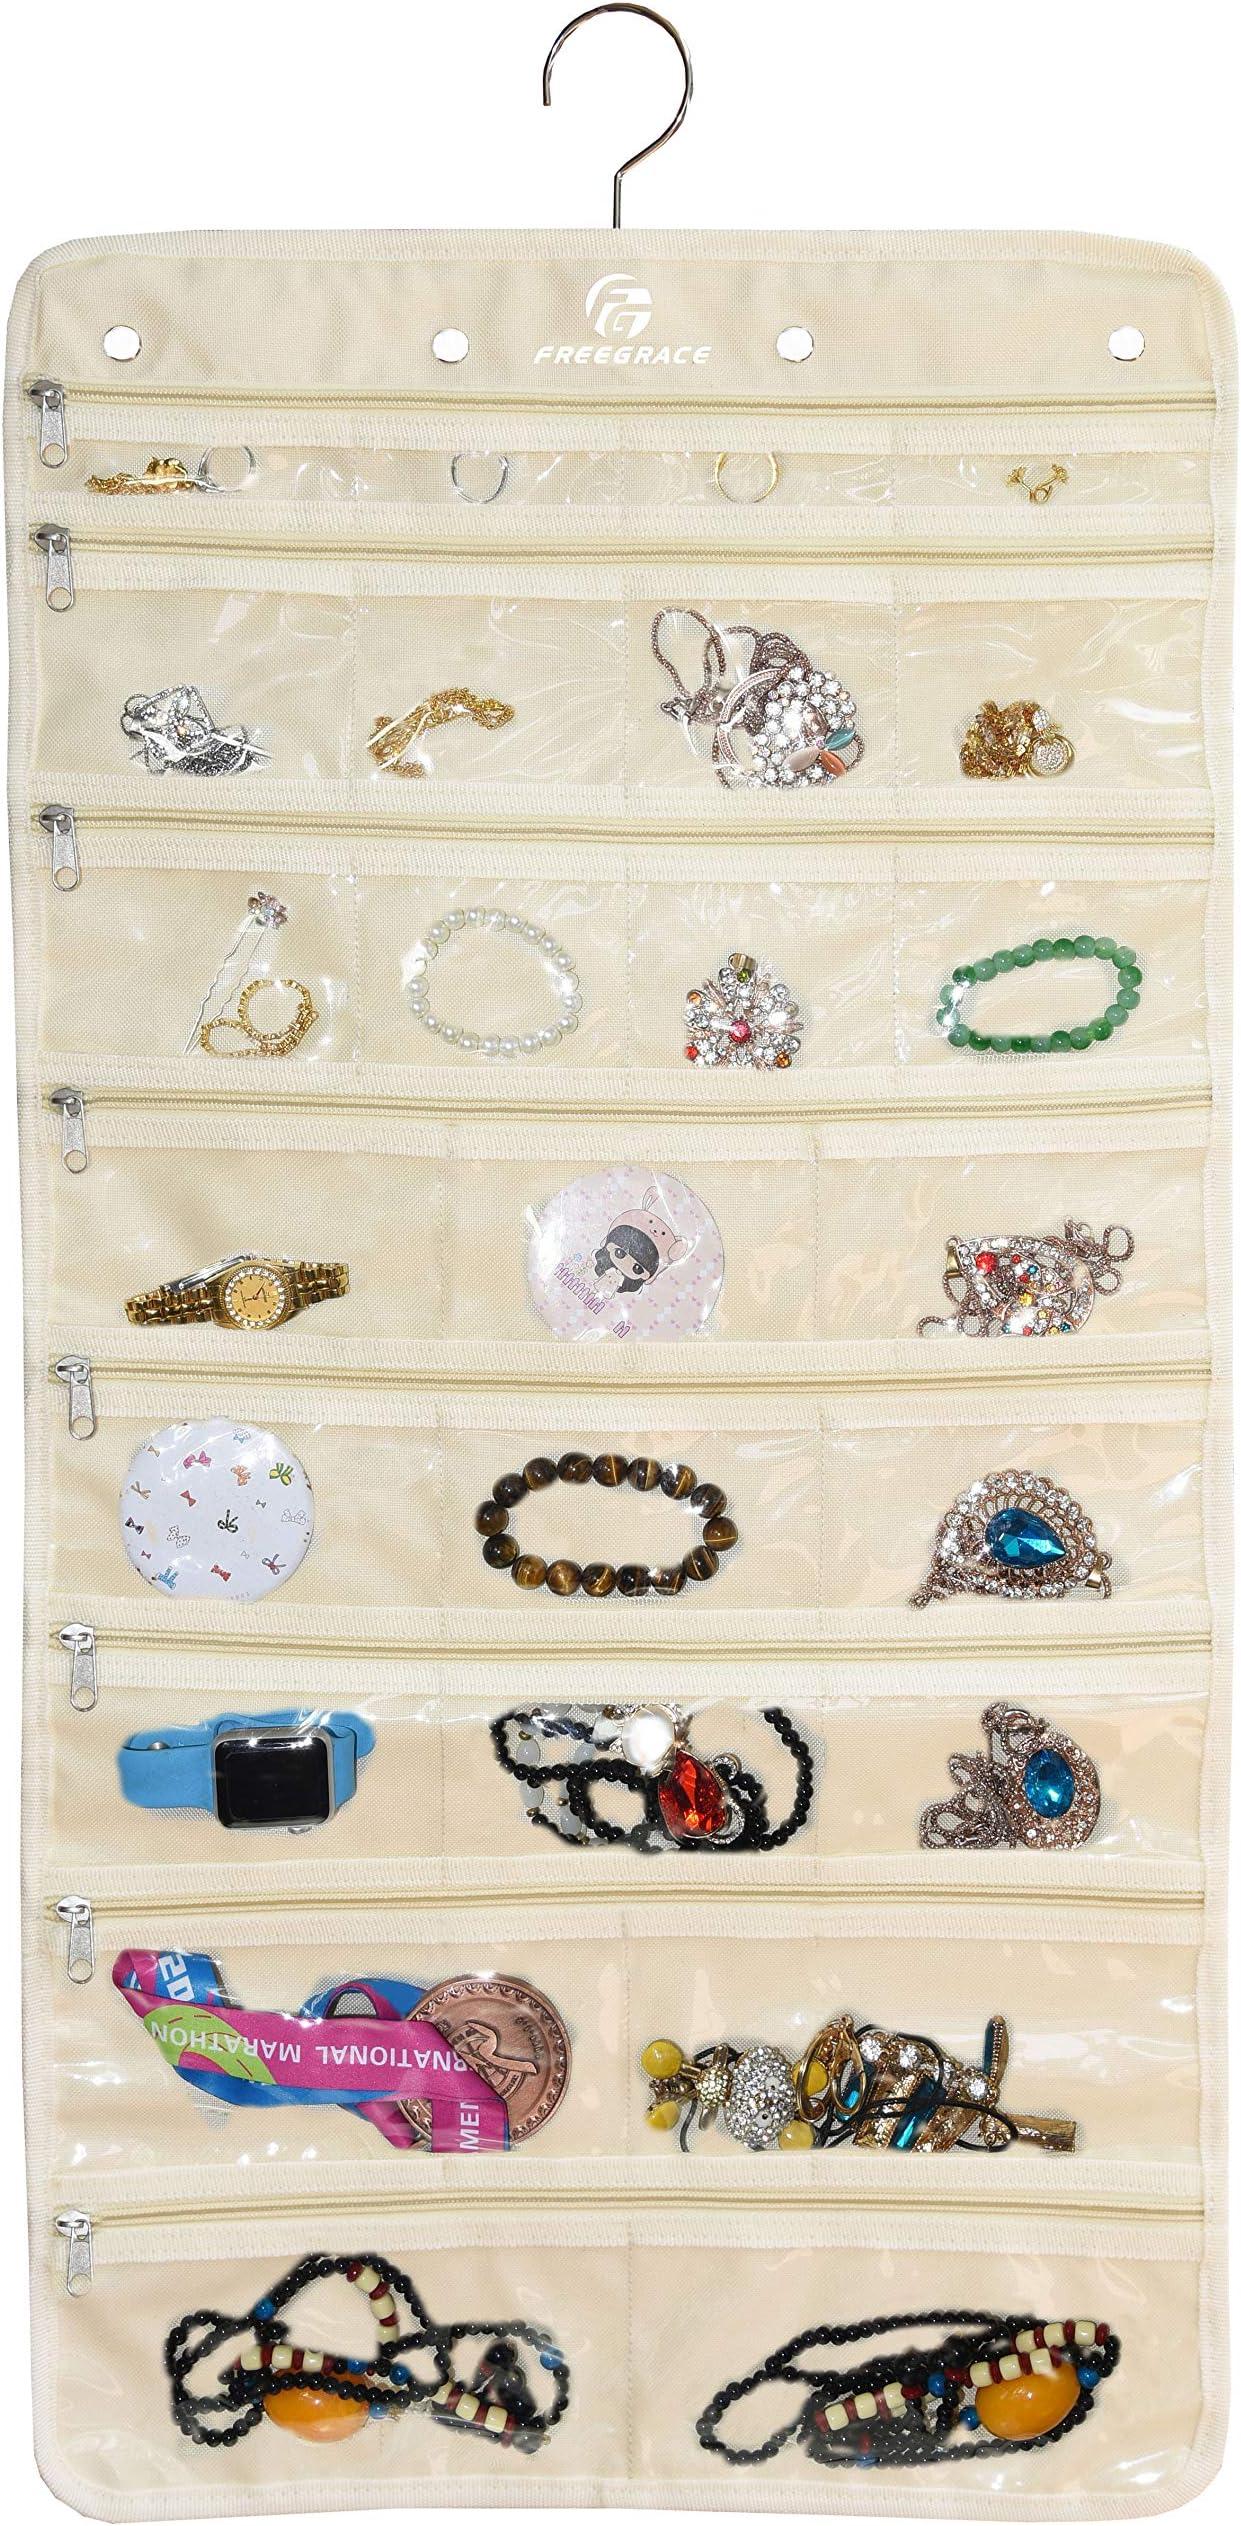 Freegrace Premium Hanging Jewelry Organizer Revolving Hanger - Secure Zipper Closure - 25 Pockets & 23 Hooks - Foldable Storage & Display Solution Jewelry & Bijoux - Beige